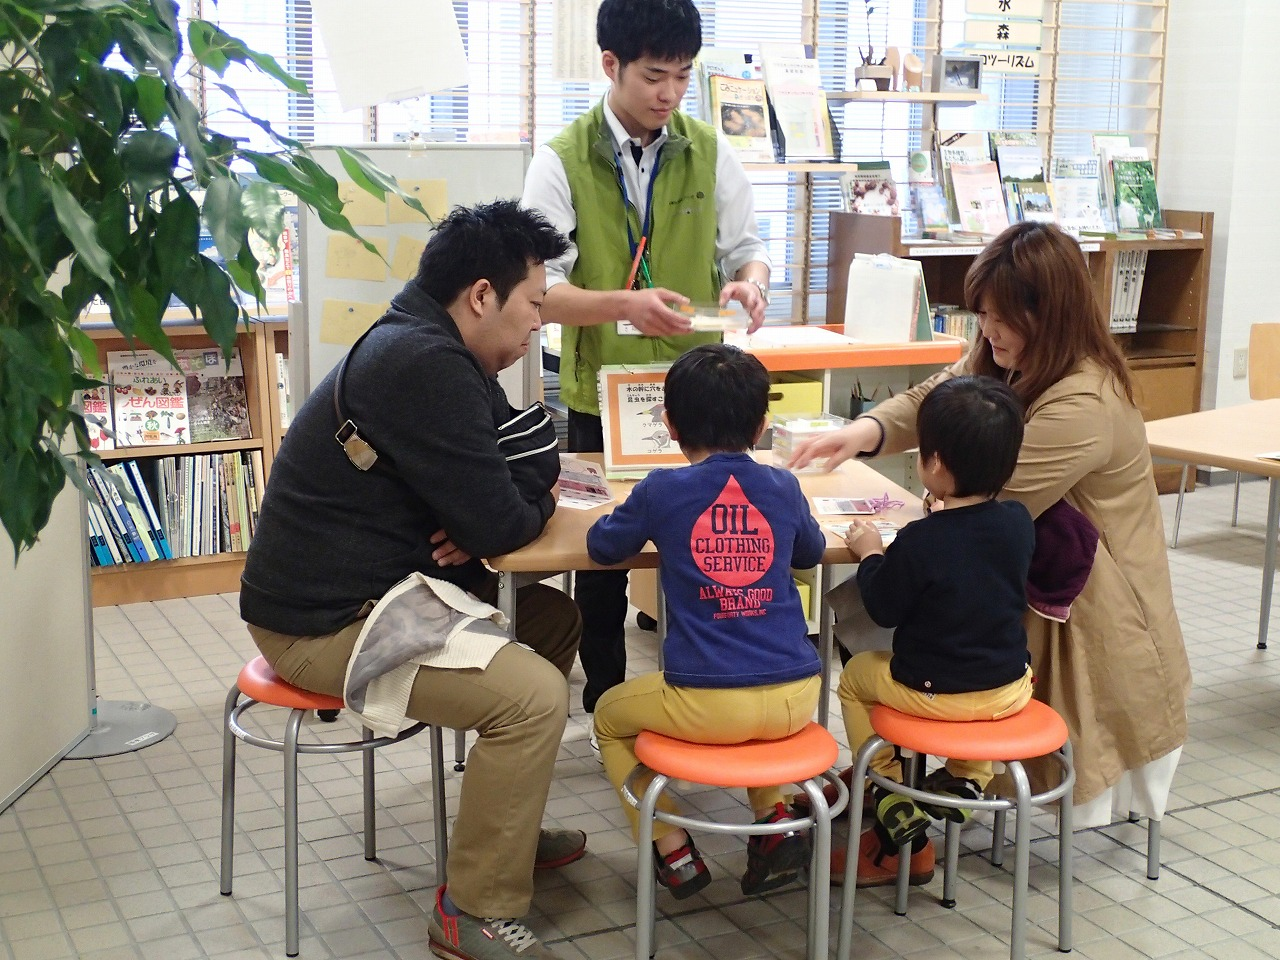 http://www.kankyo.sl-plaza.jp/blog/%E3%81%A8%E3%82%8A4.jpg